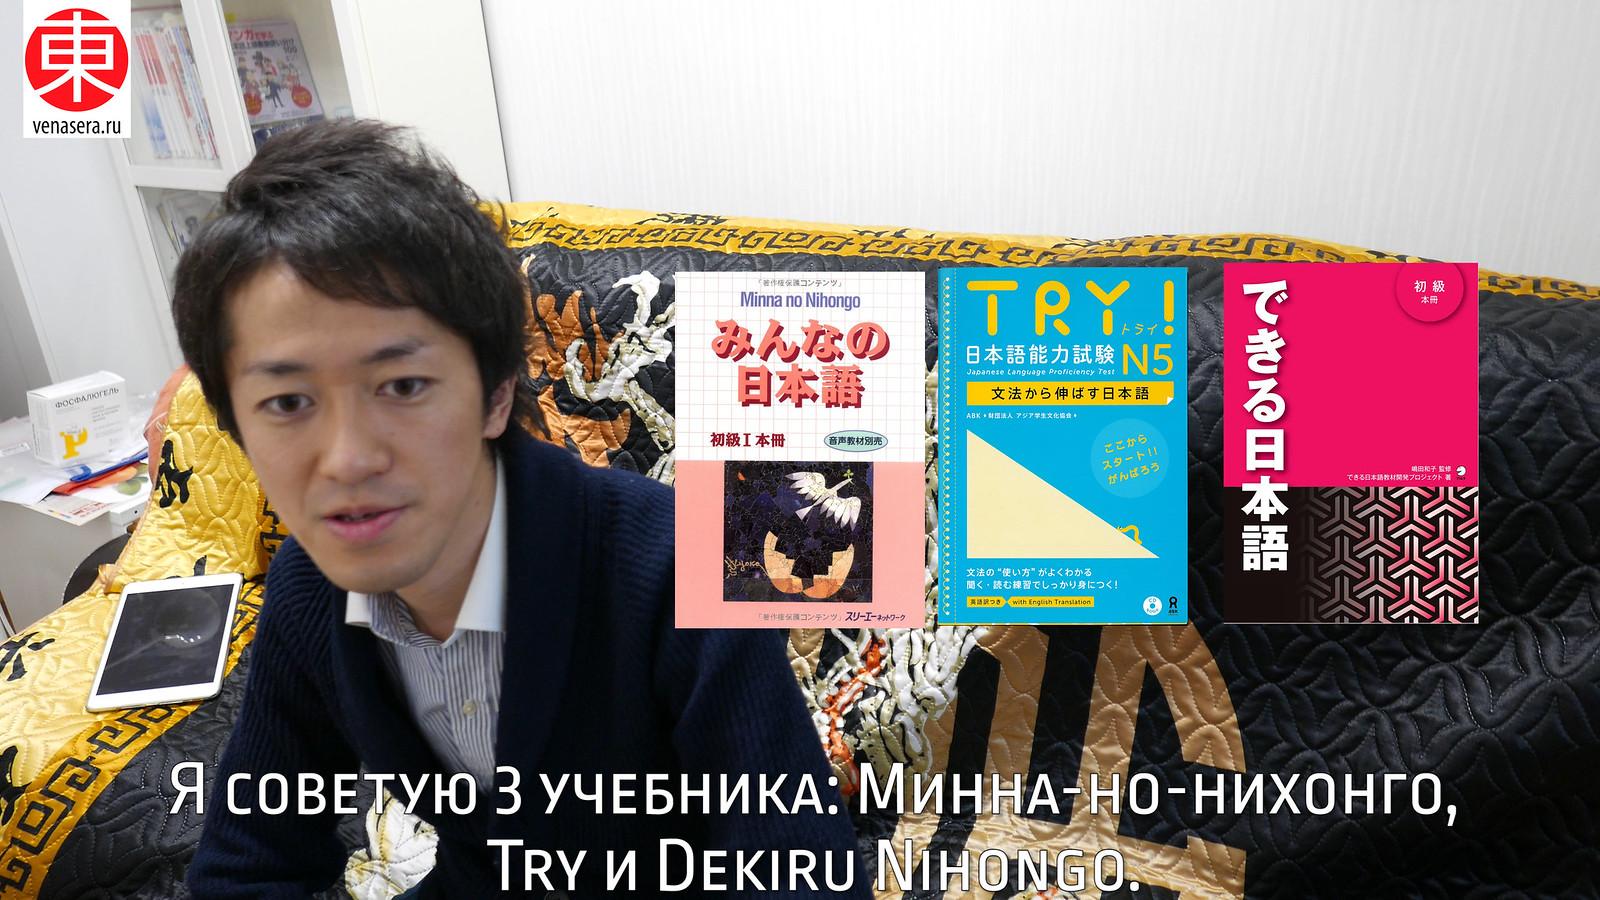 Минна-но-нихонго (みんなの日本語), Try (トライ) и Dekiru Nihongo (できるにほんご)